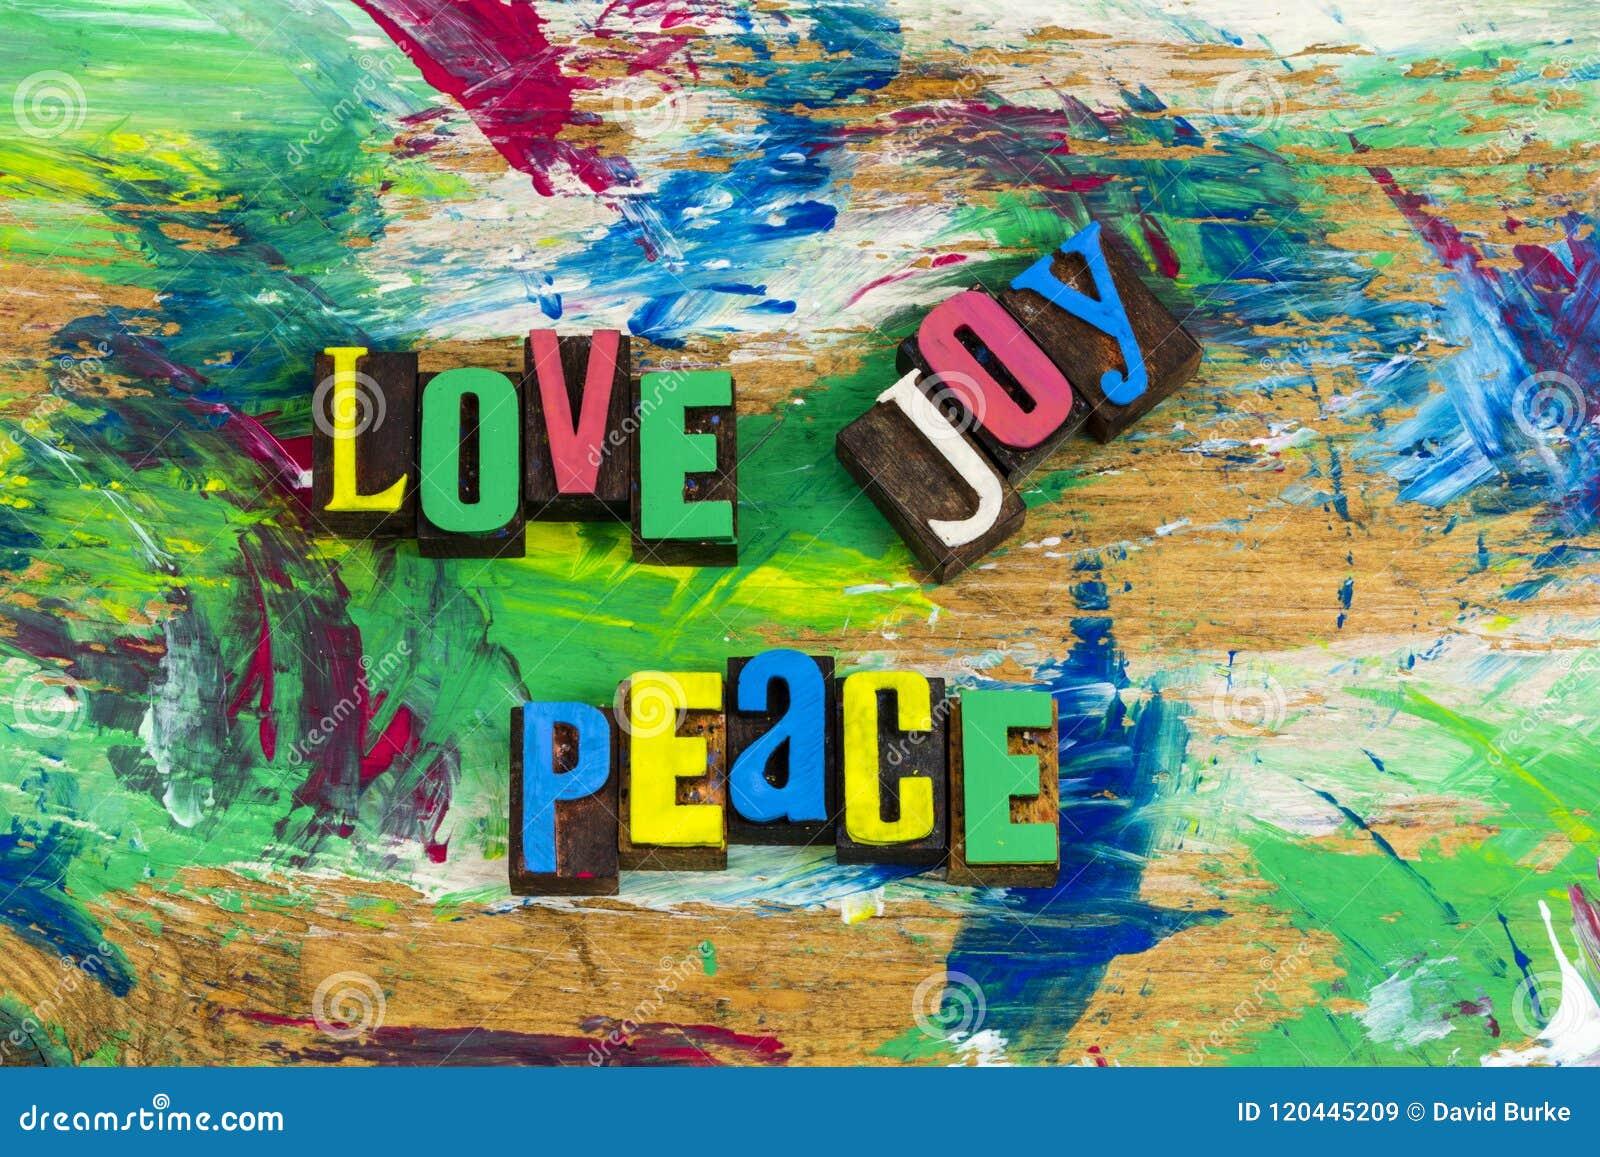 Love Joy Peace Comfort Letterpress Stock Image Image Of Blocks Wood 120445209